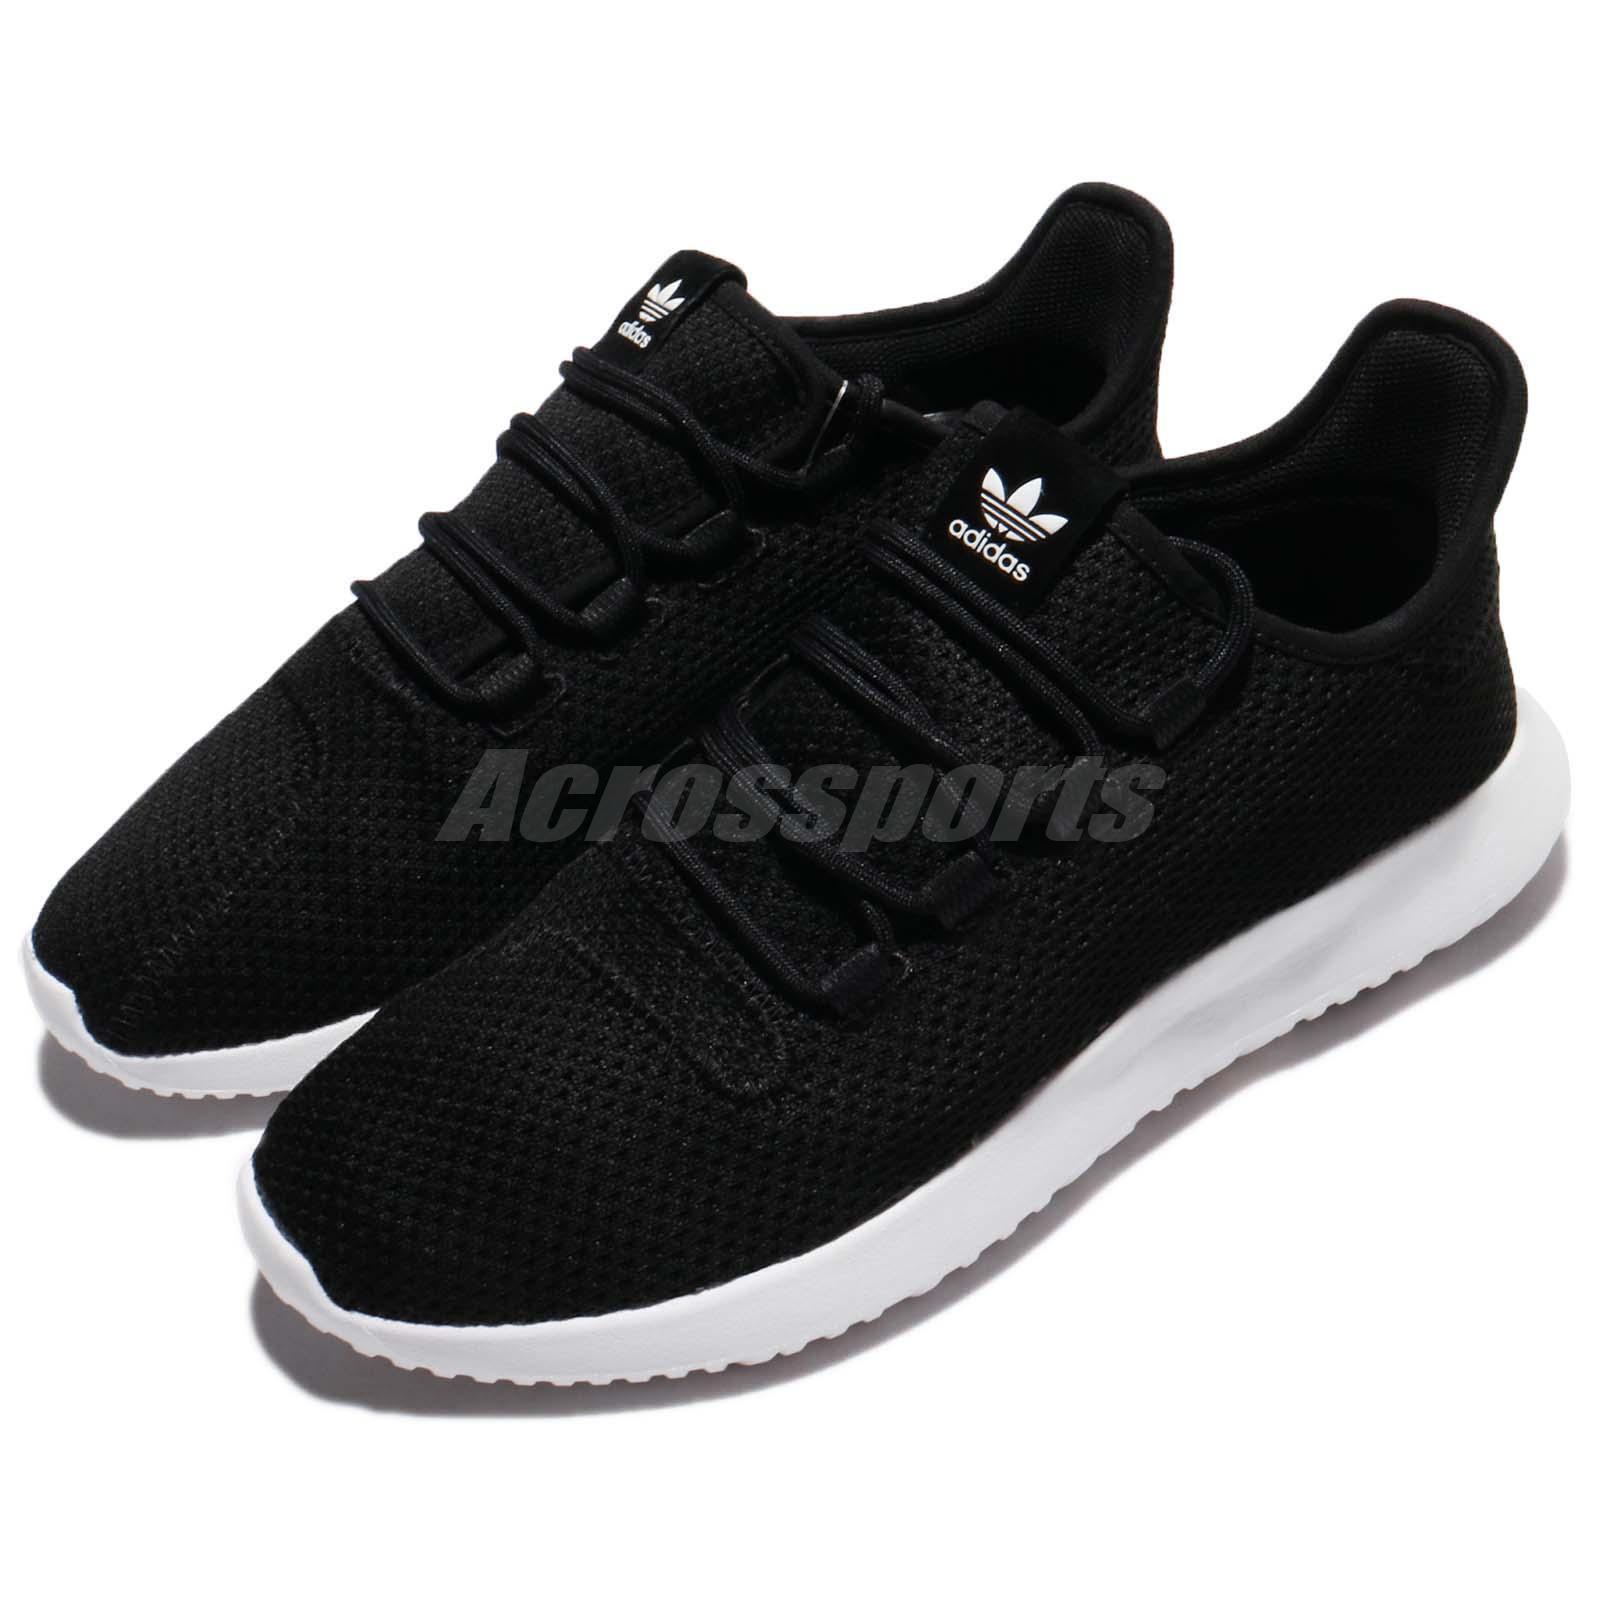 adidas Originals Tubular Shadow Black White Men Running Shoe Sneaker BB6806 Seasonal clearance sale